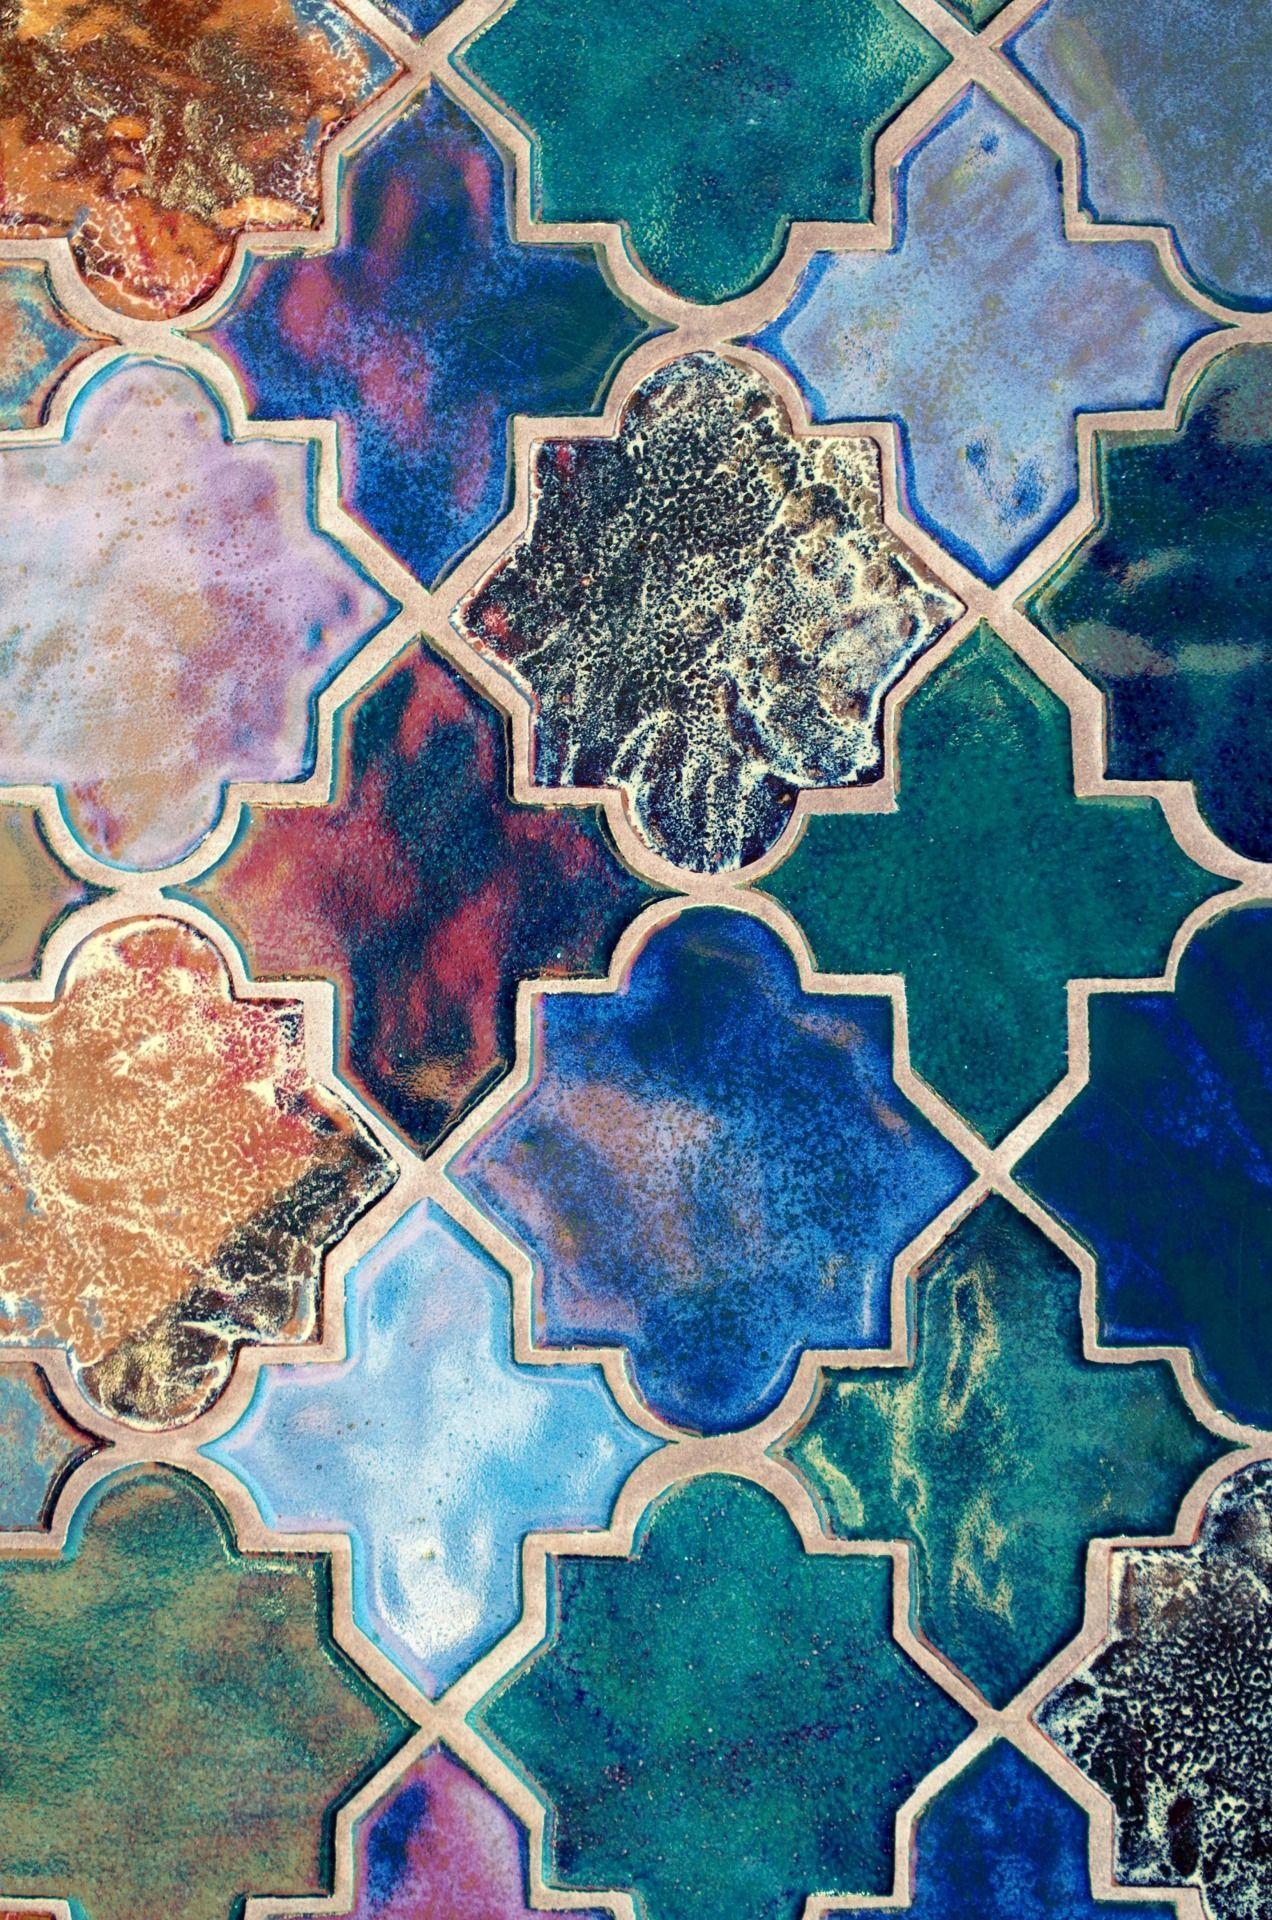 Image Result For Mismatched Colored Tile Retro Home